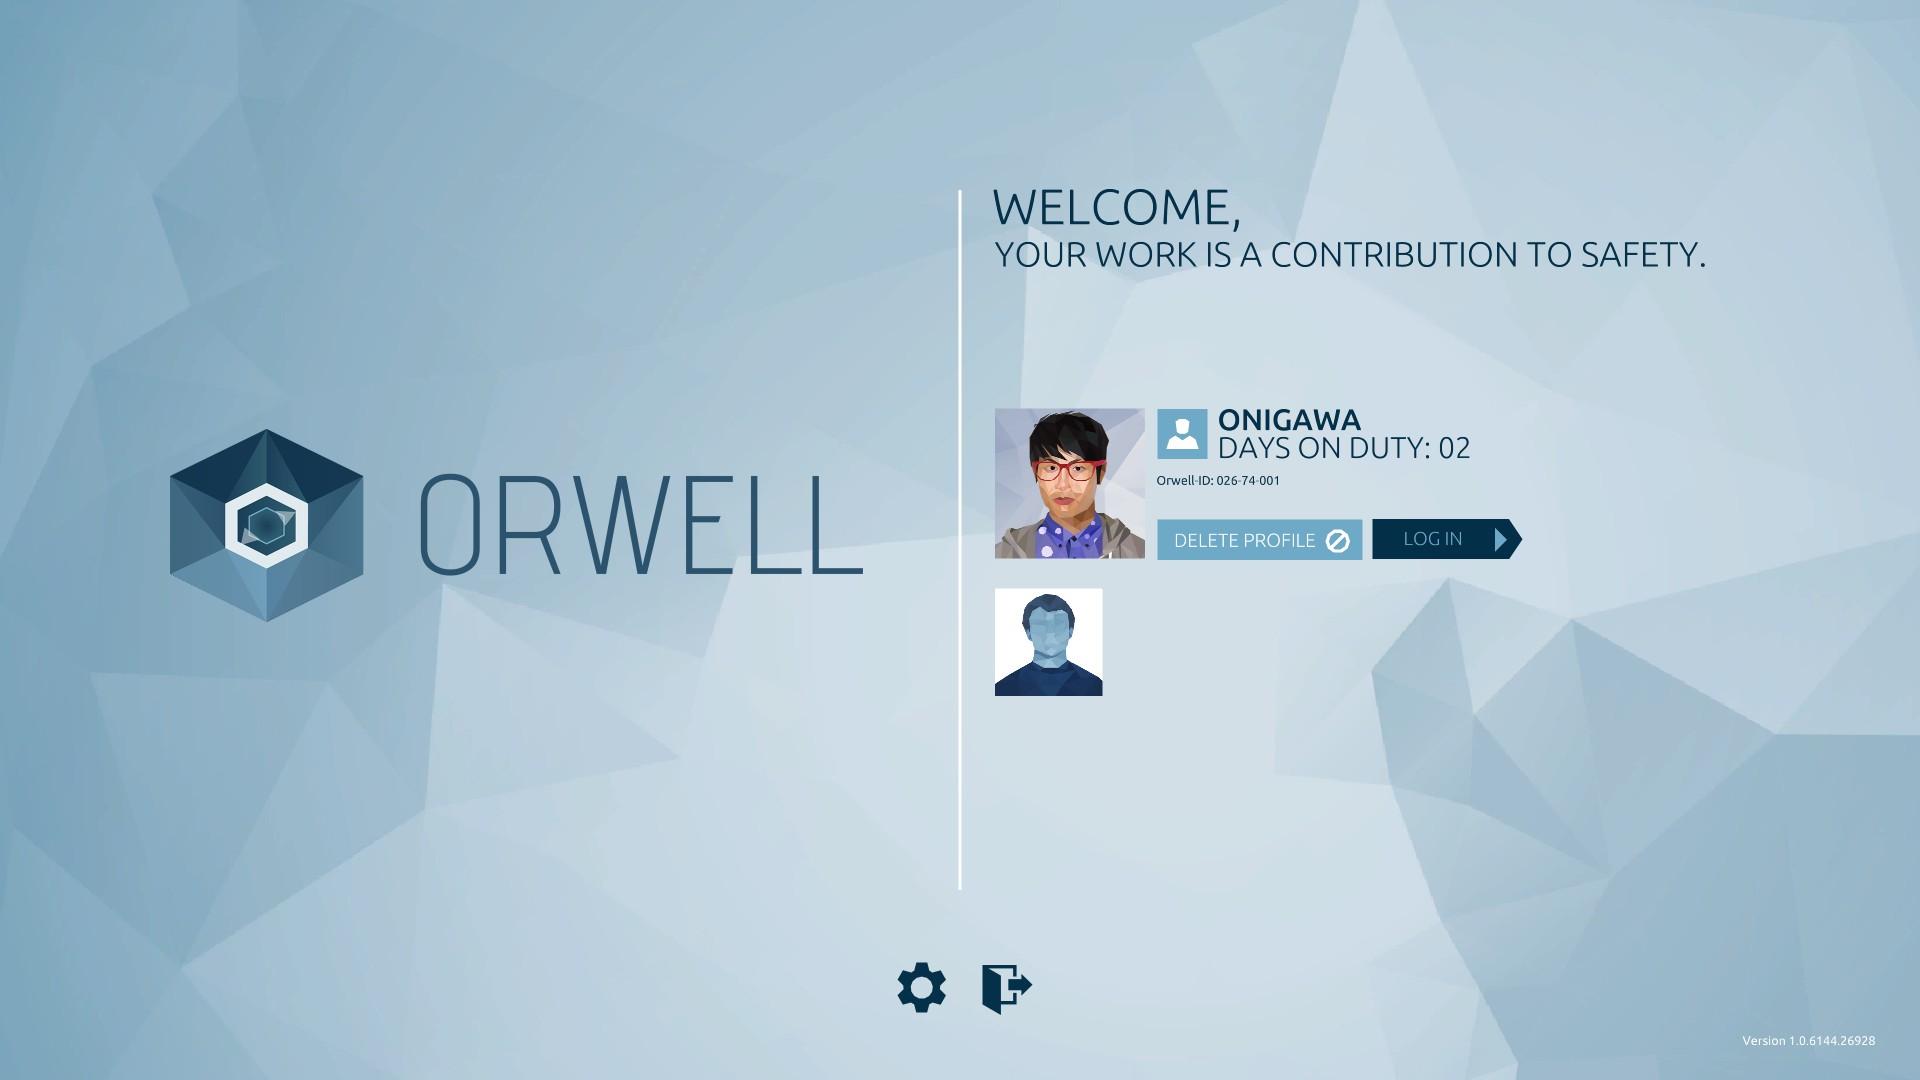 Orwell 5